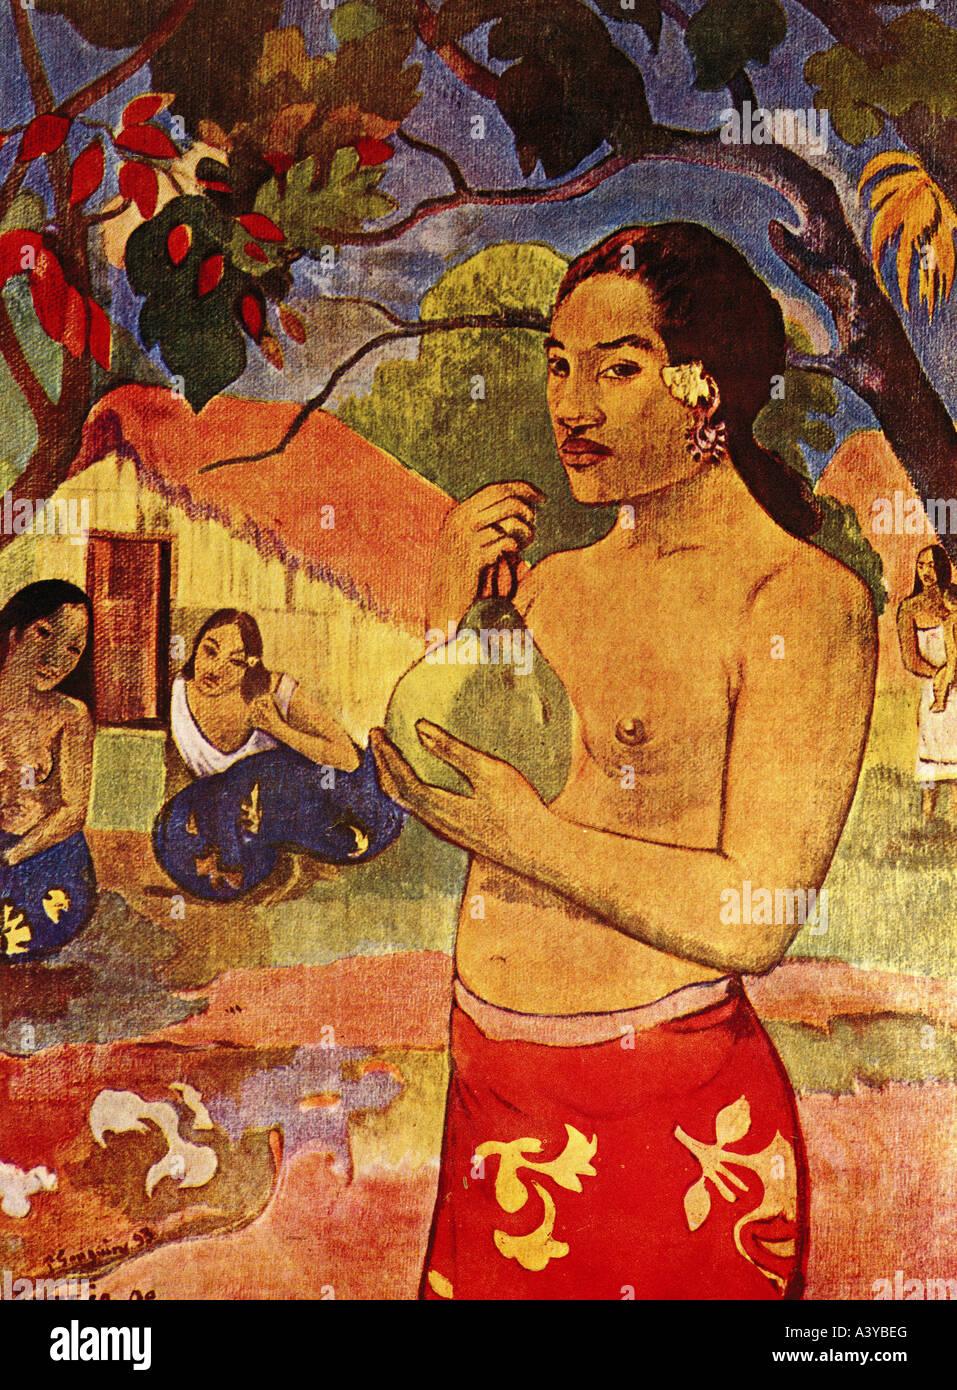 """Fine Arts, Gauguin, Paulo, (1848 - 1903), pintura, 'Tahiti mulher com frutas "", 1893, óleo sobre Imagens de Stock"